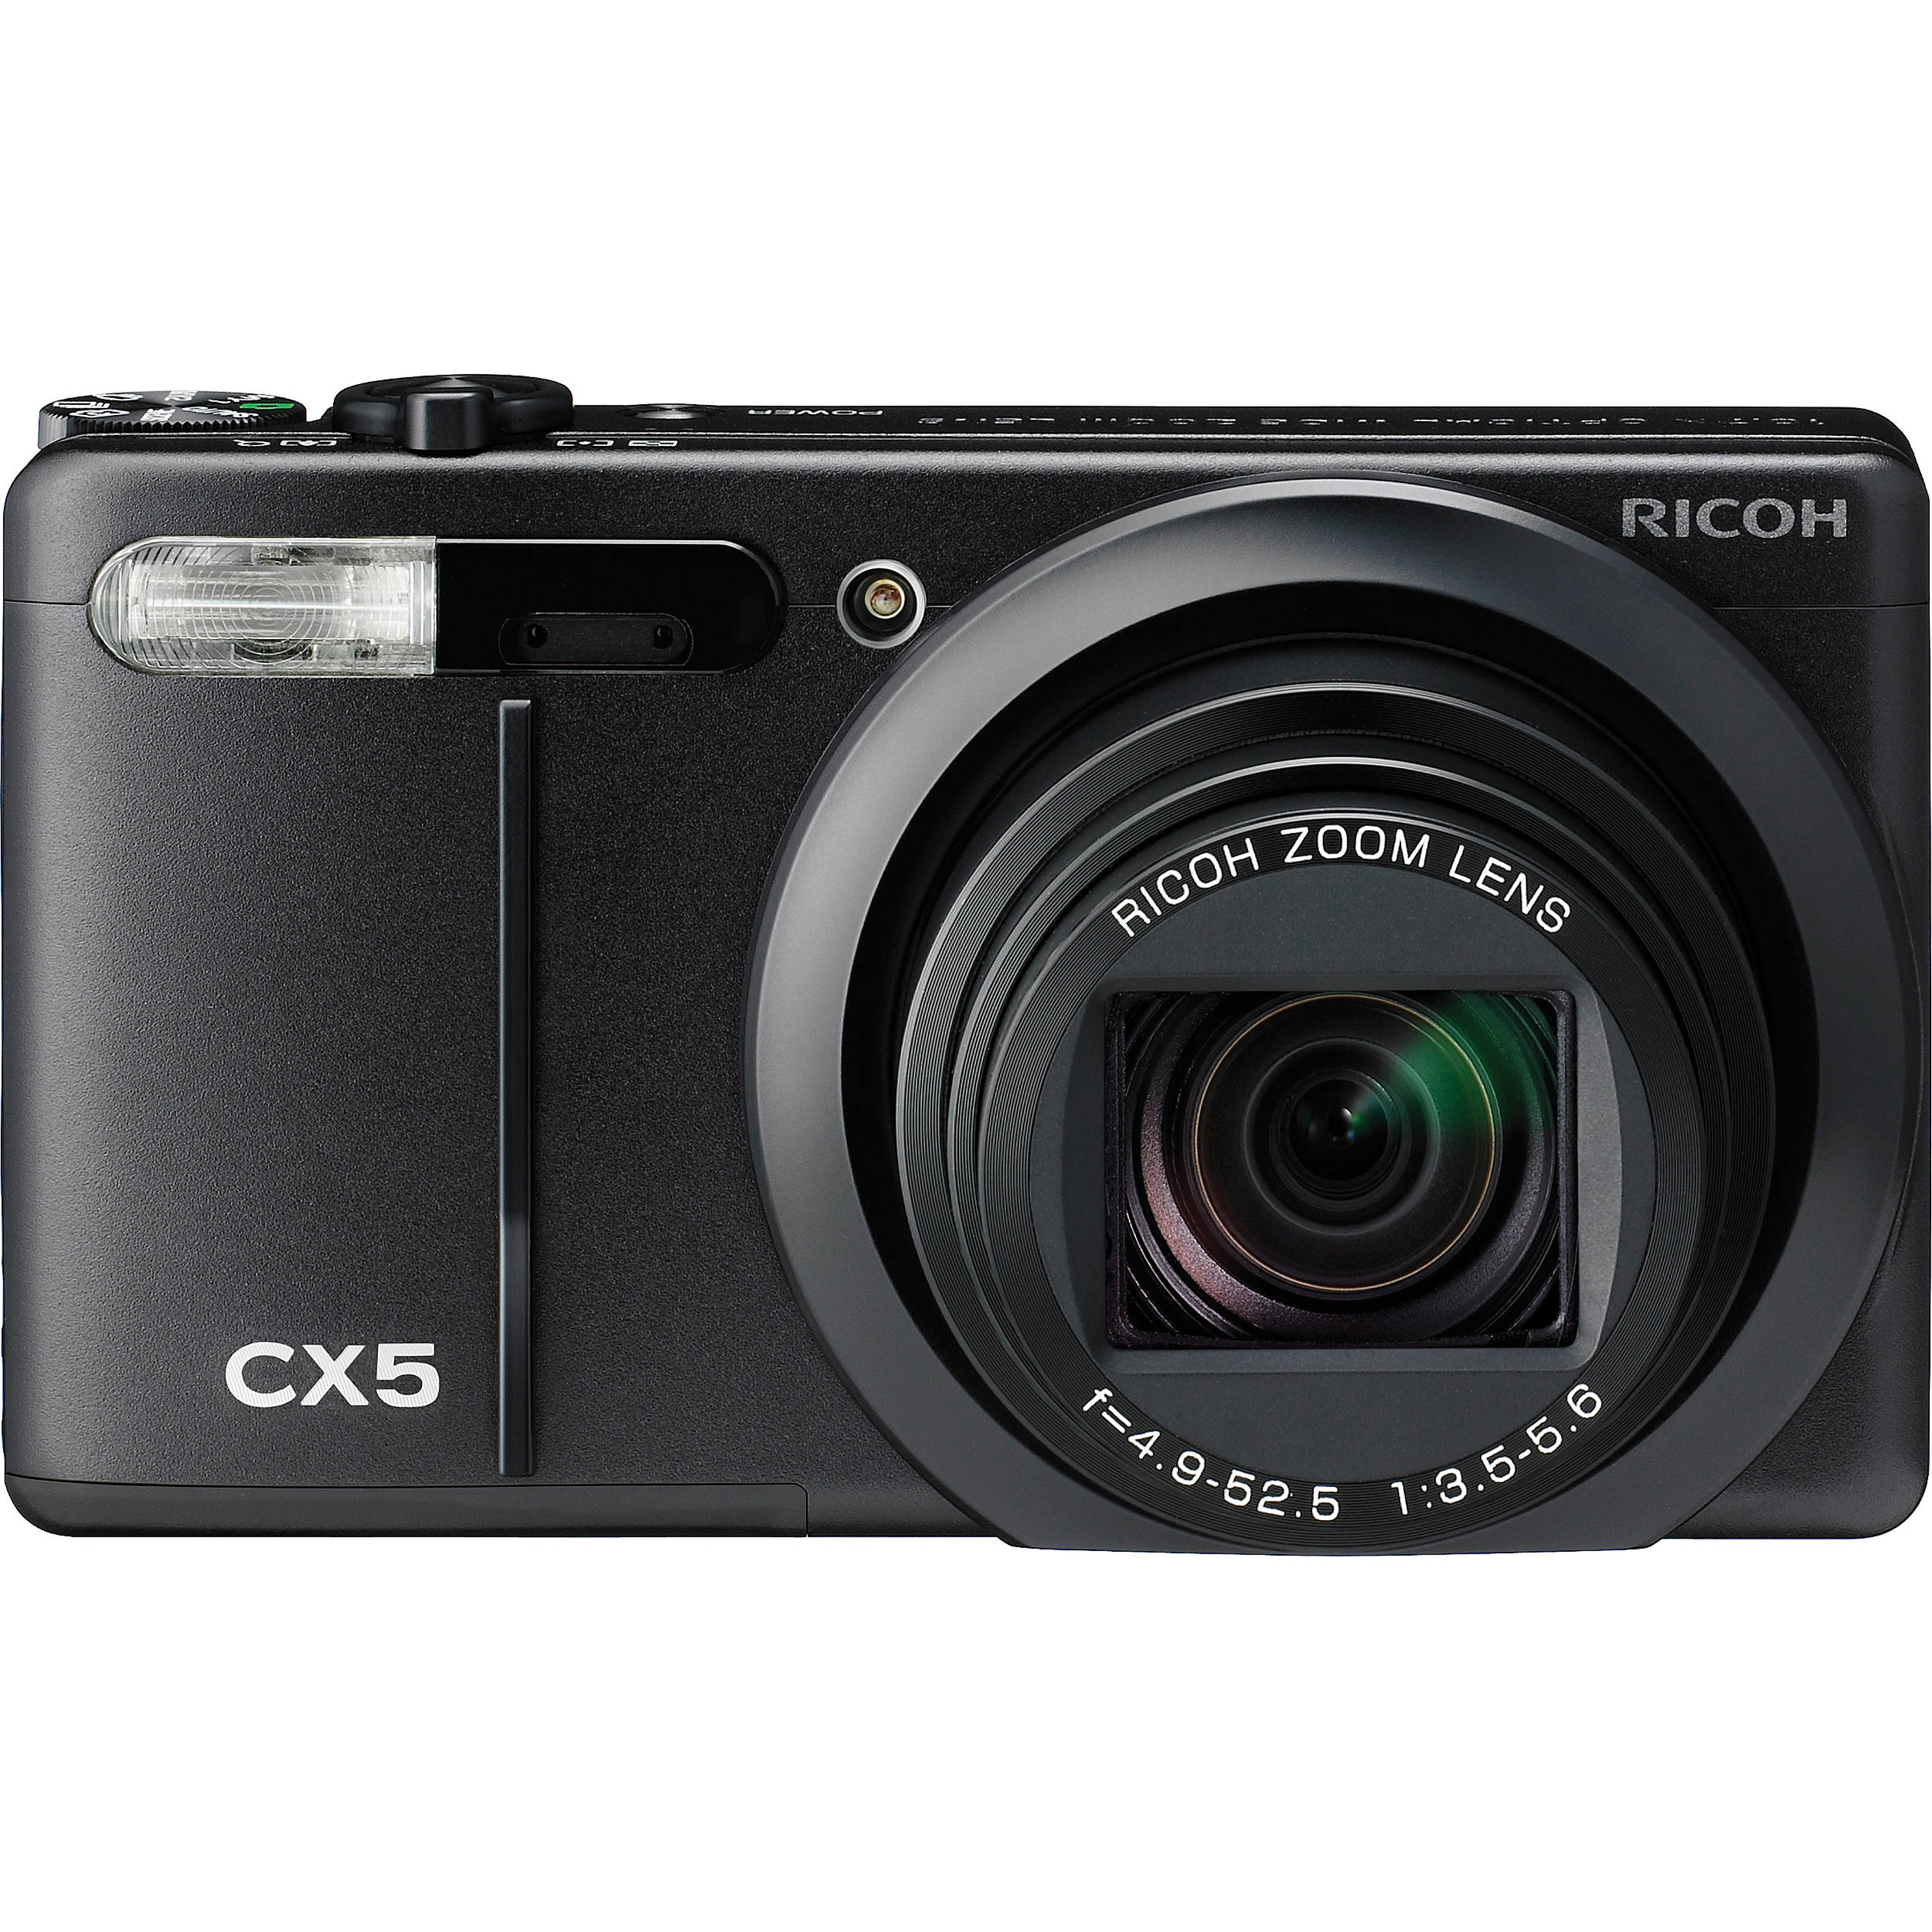 Ricoh CX5 Digital Camera Windows 8 X64 Driver Download